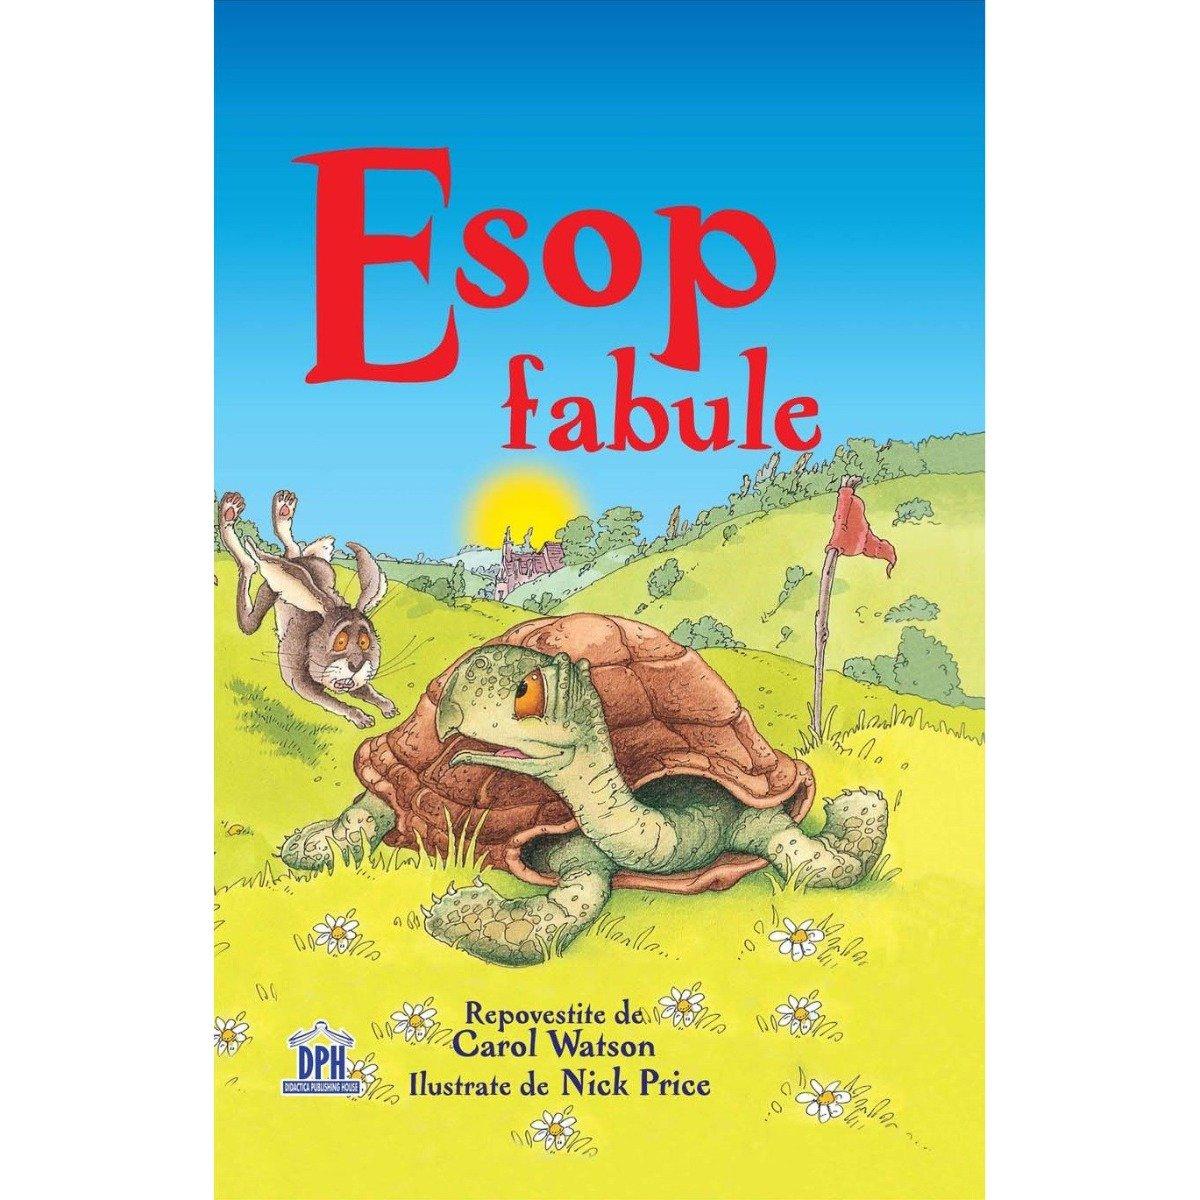 Carte Esop - Fabule, Editura DPH imagine